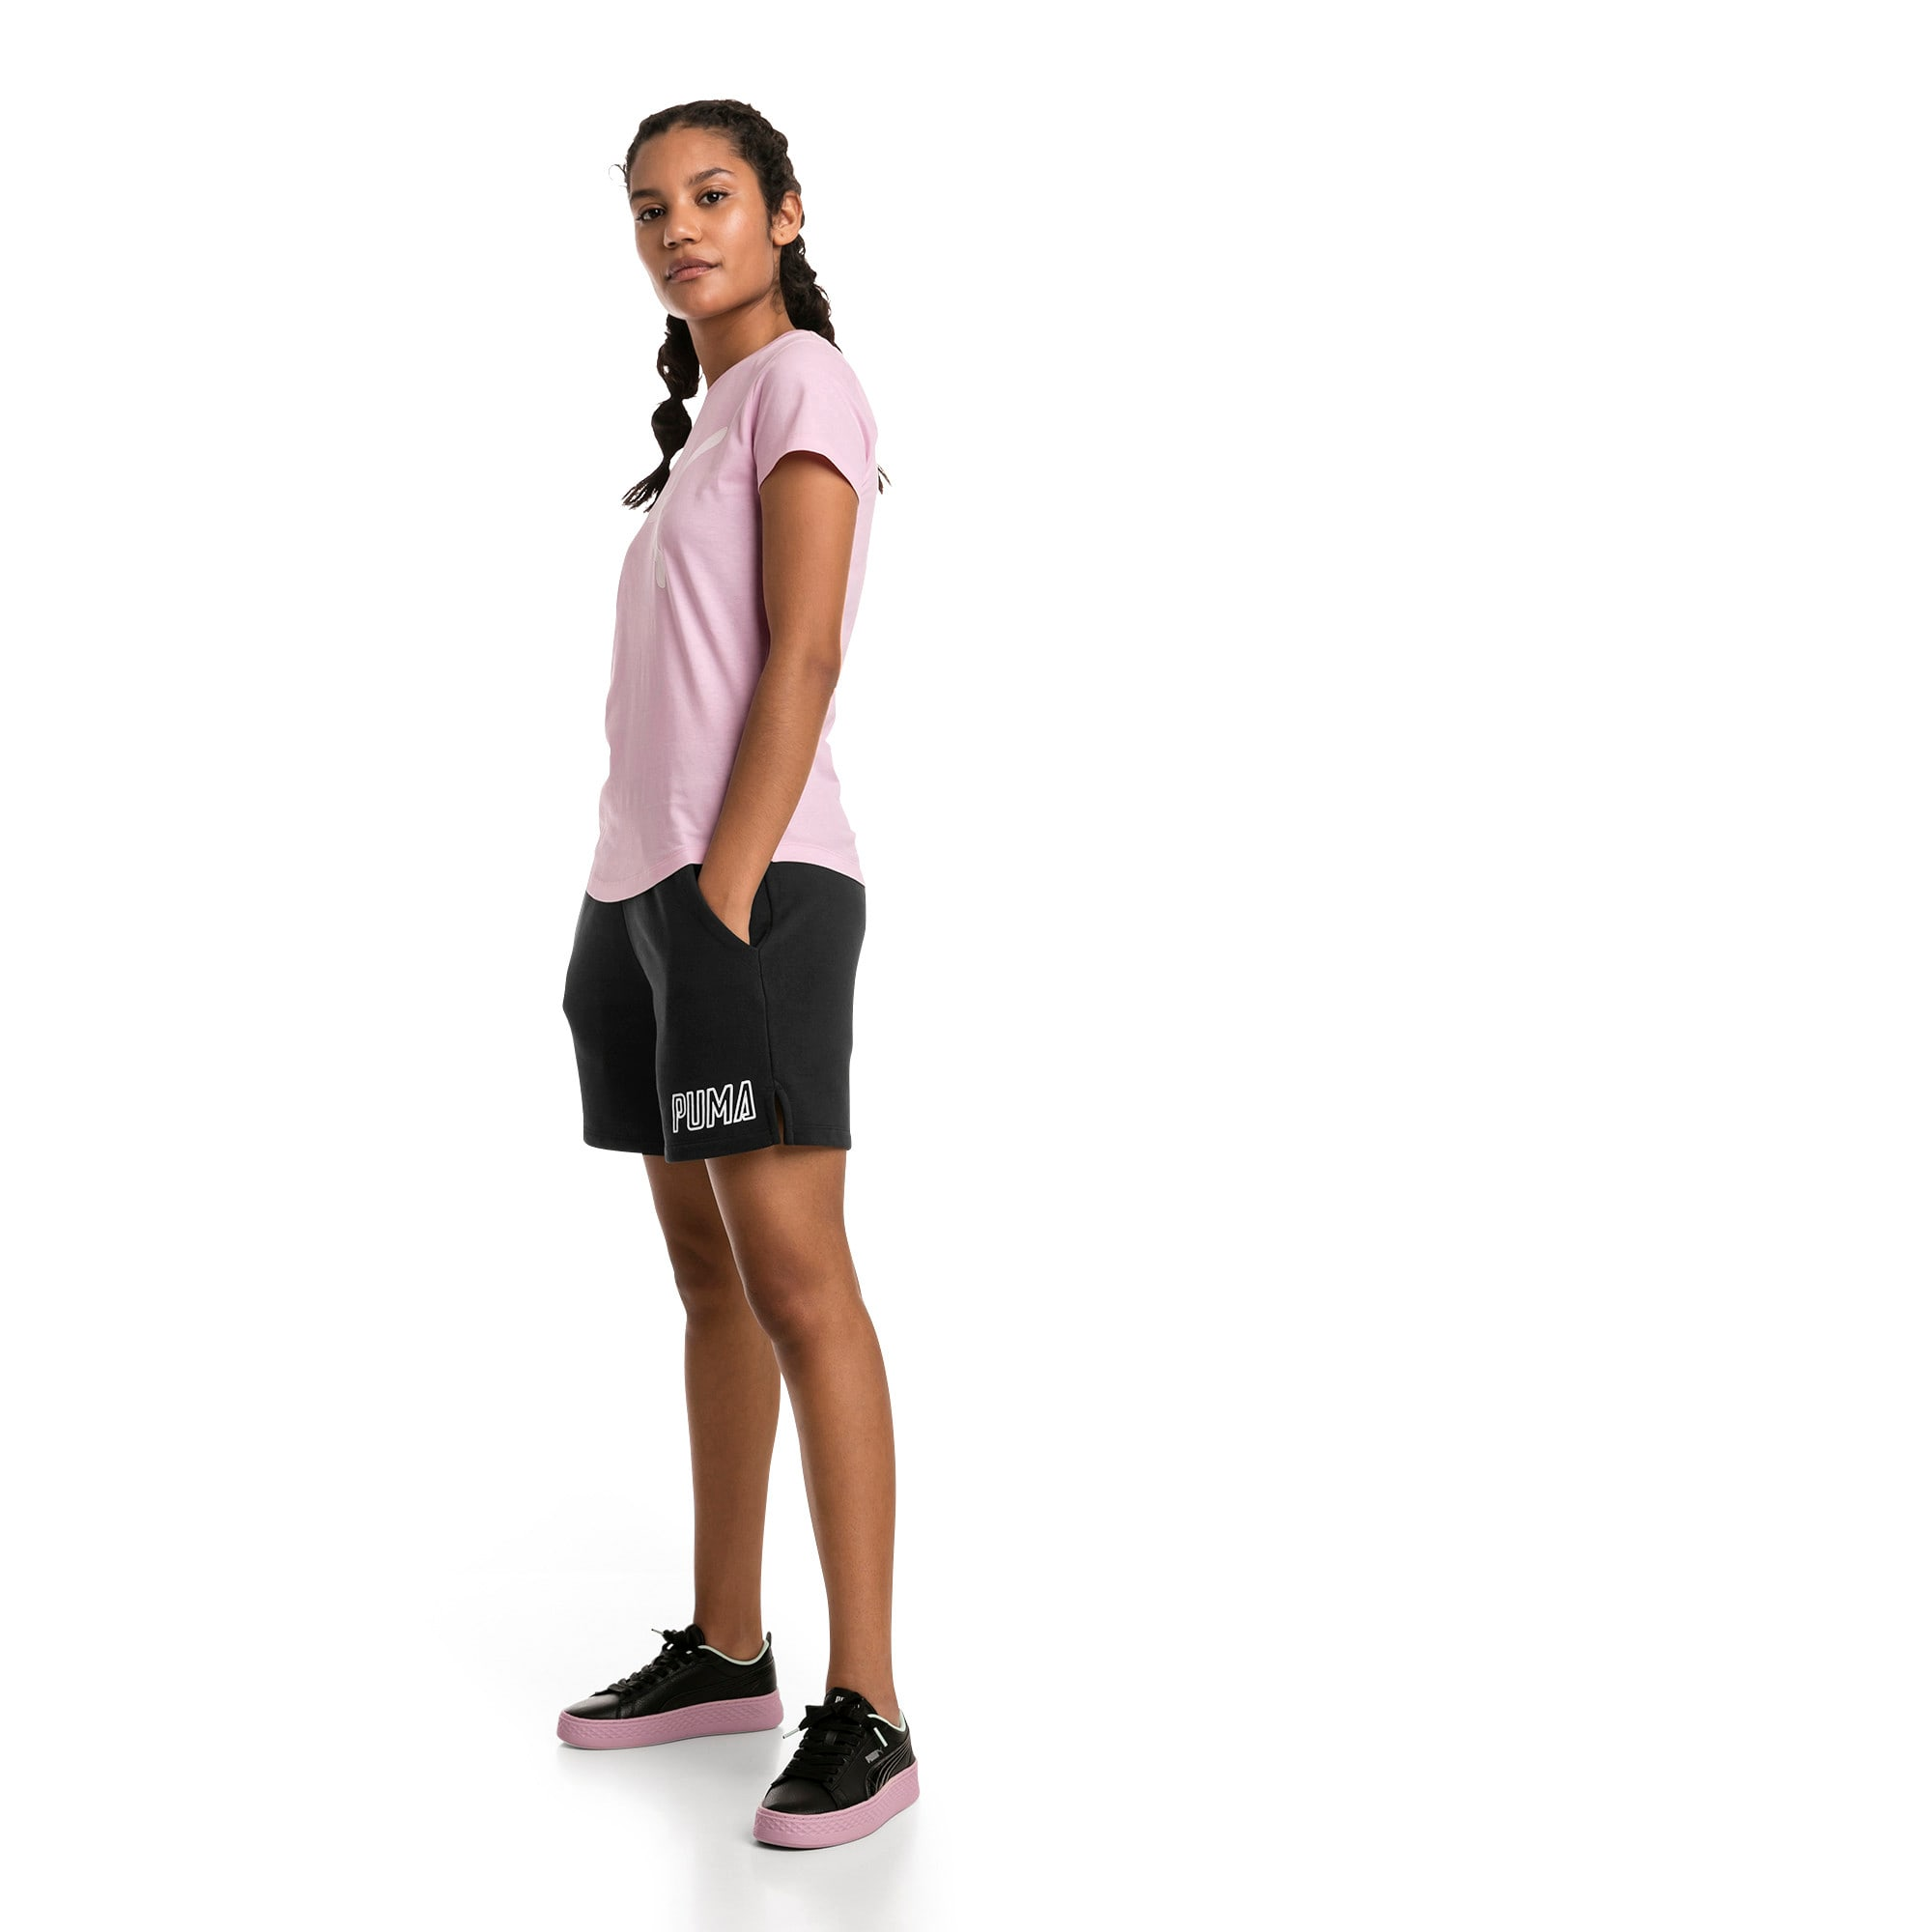 Thumbnail 3 of Athletics Women's Sweat Shorts, Puma Black, medium